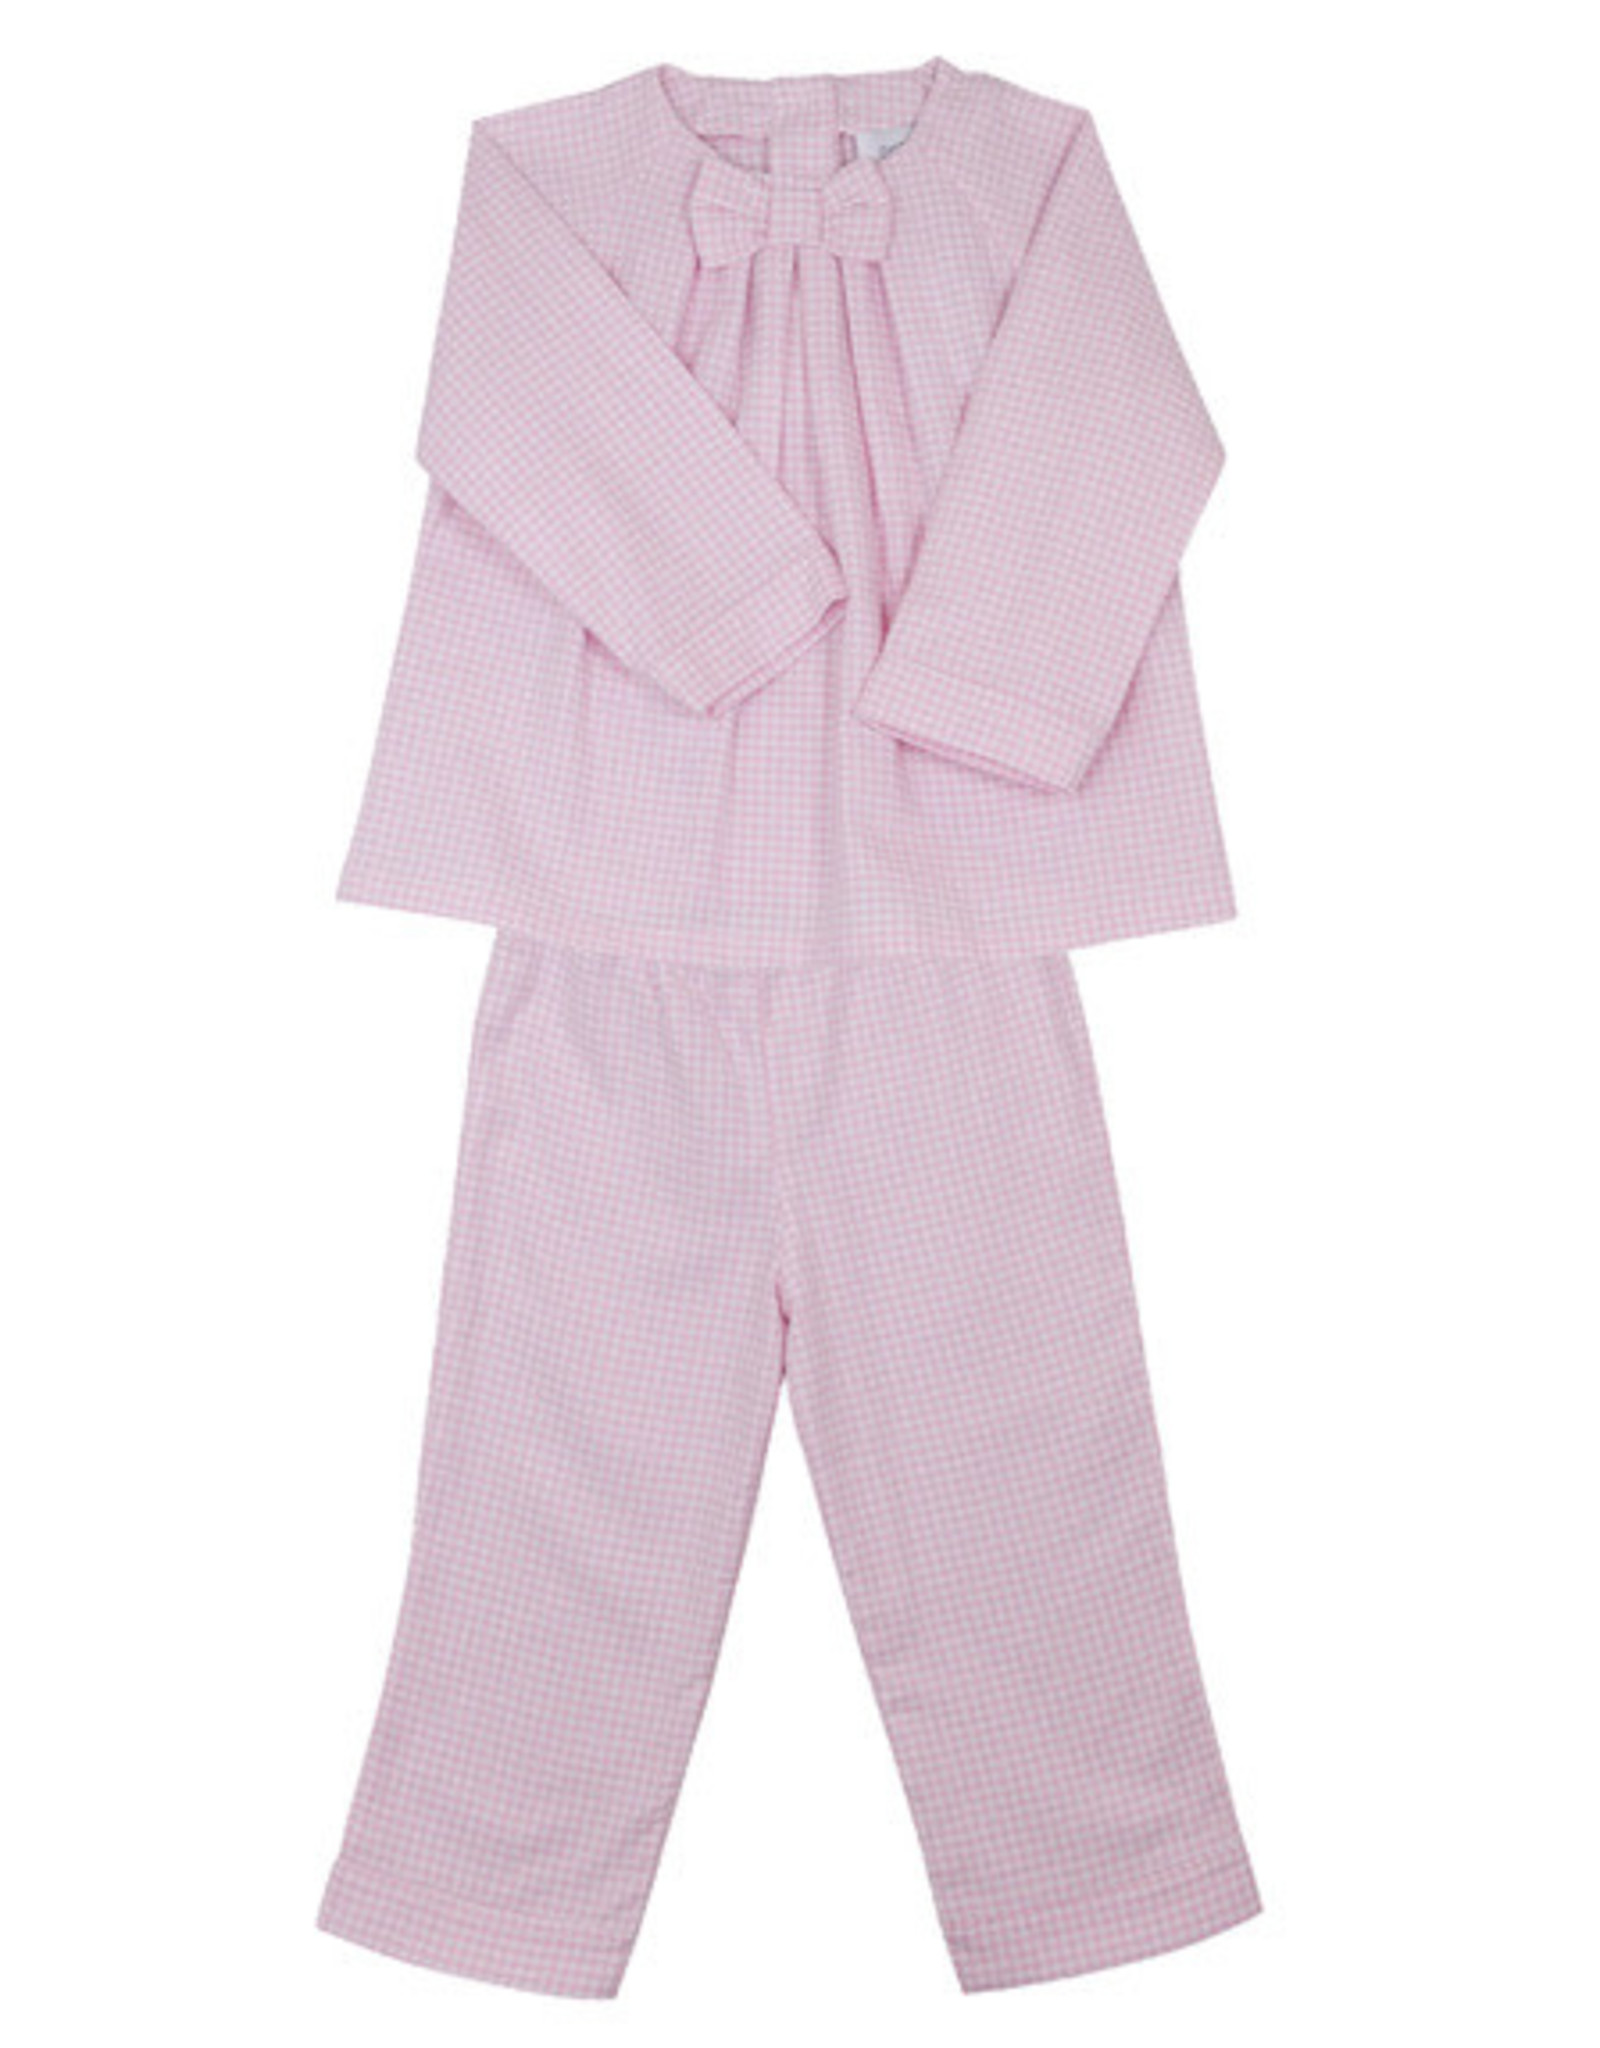 COTOLINI Pyjama Giulietta vichy rose